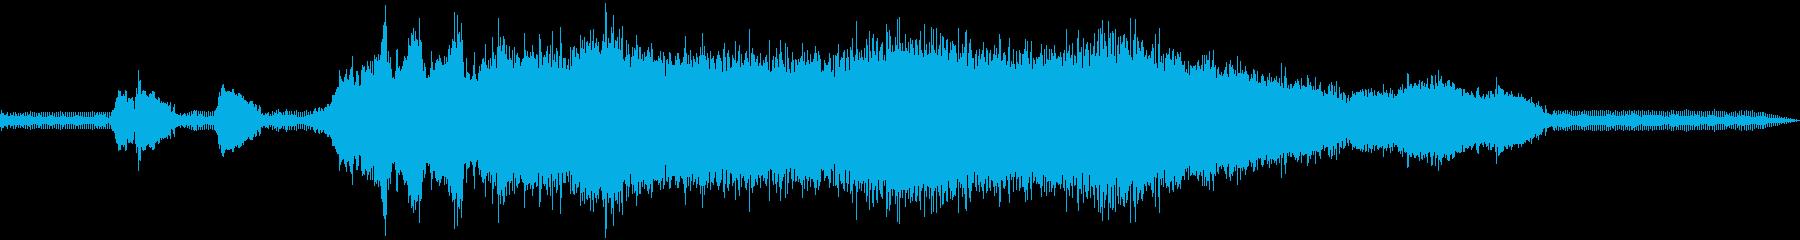 450 CC ATV 4X4:オン...の再生済みの波形